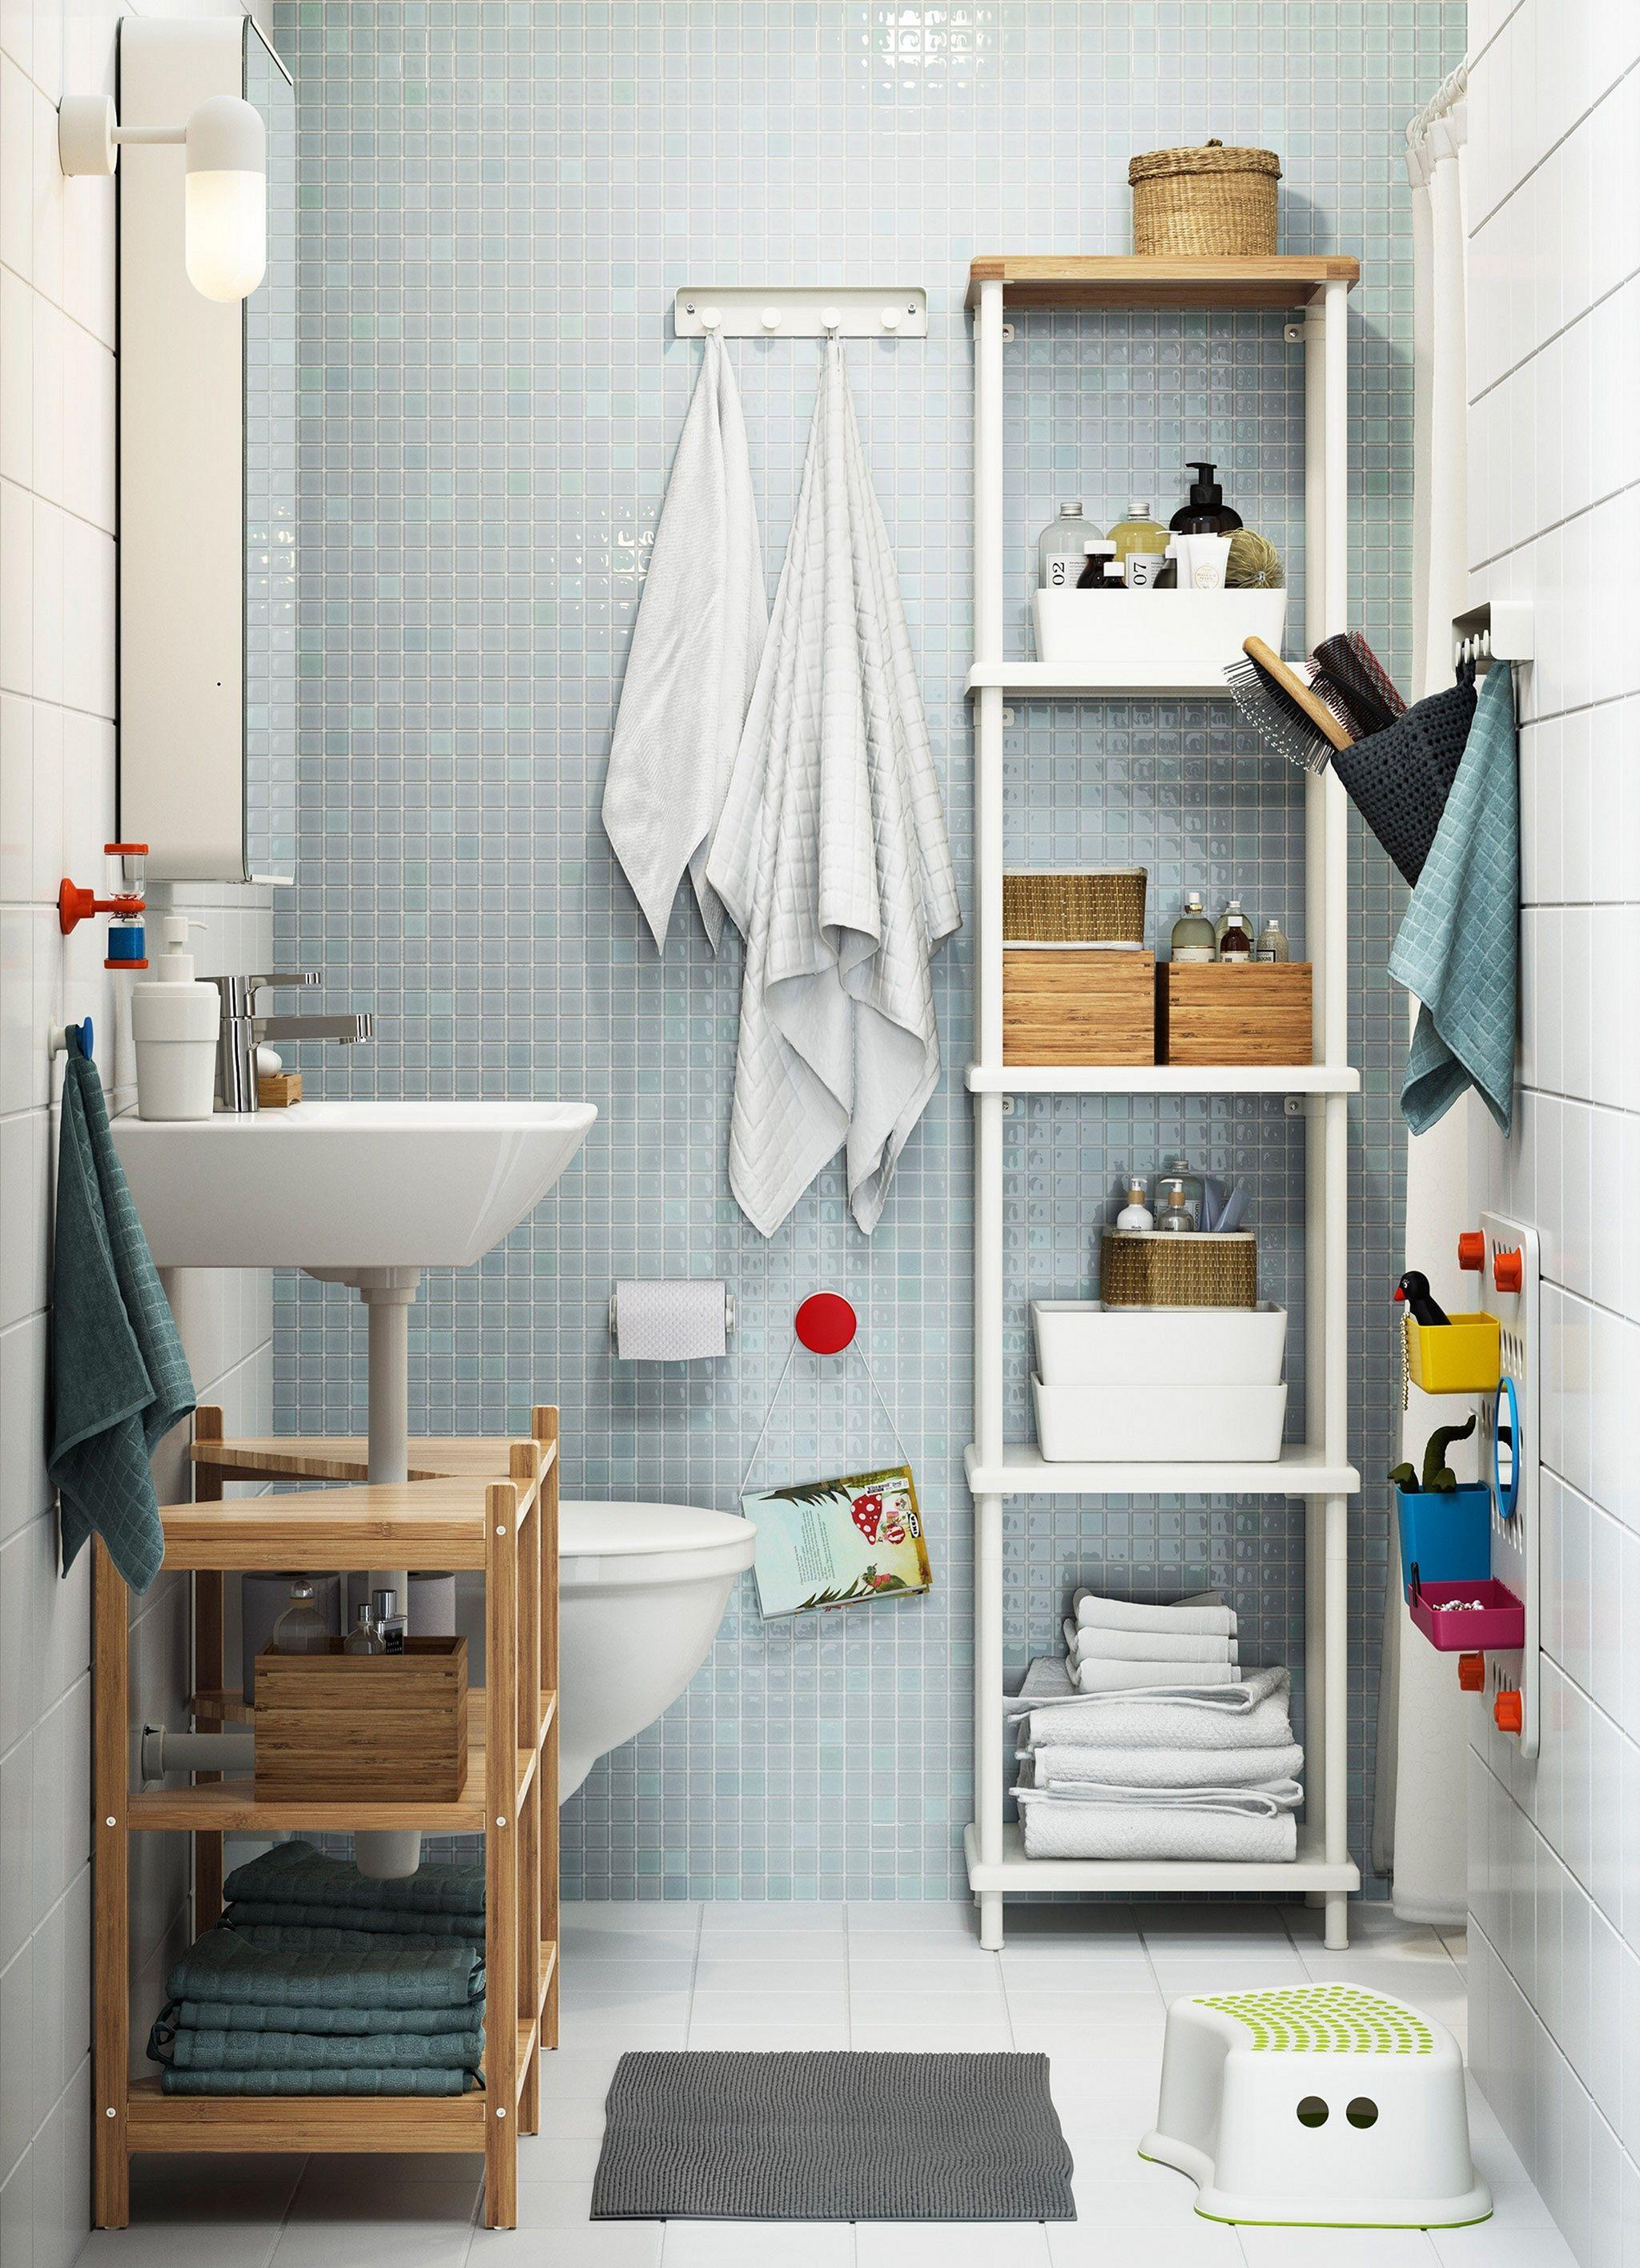 23 Awesome Space Shelving For Tiny Bathroom Decoration Ideas Small Bathroom Storage Ikea Bathroom Bathroom Decor